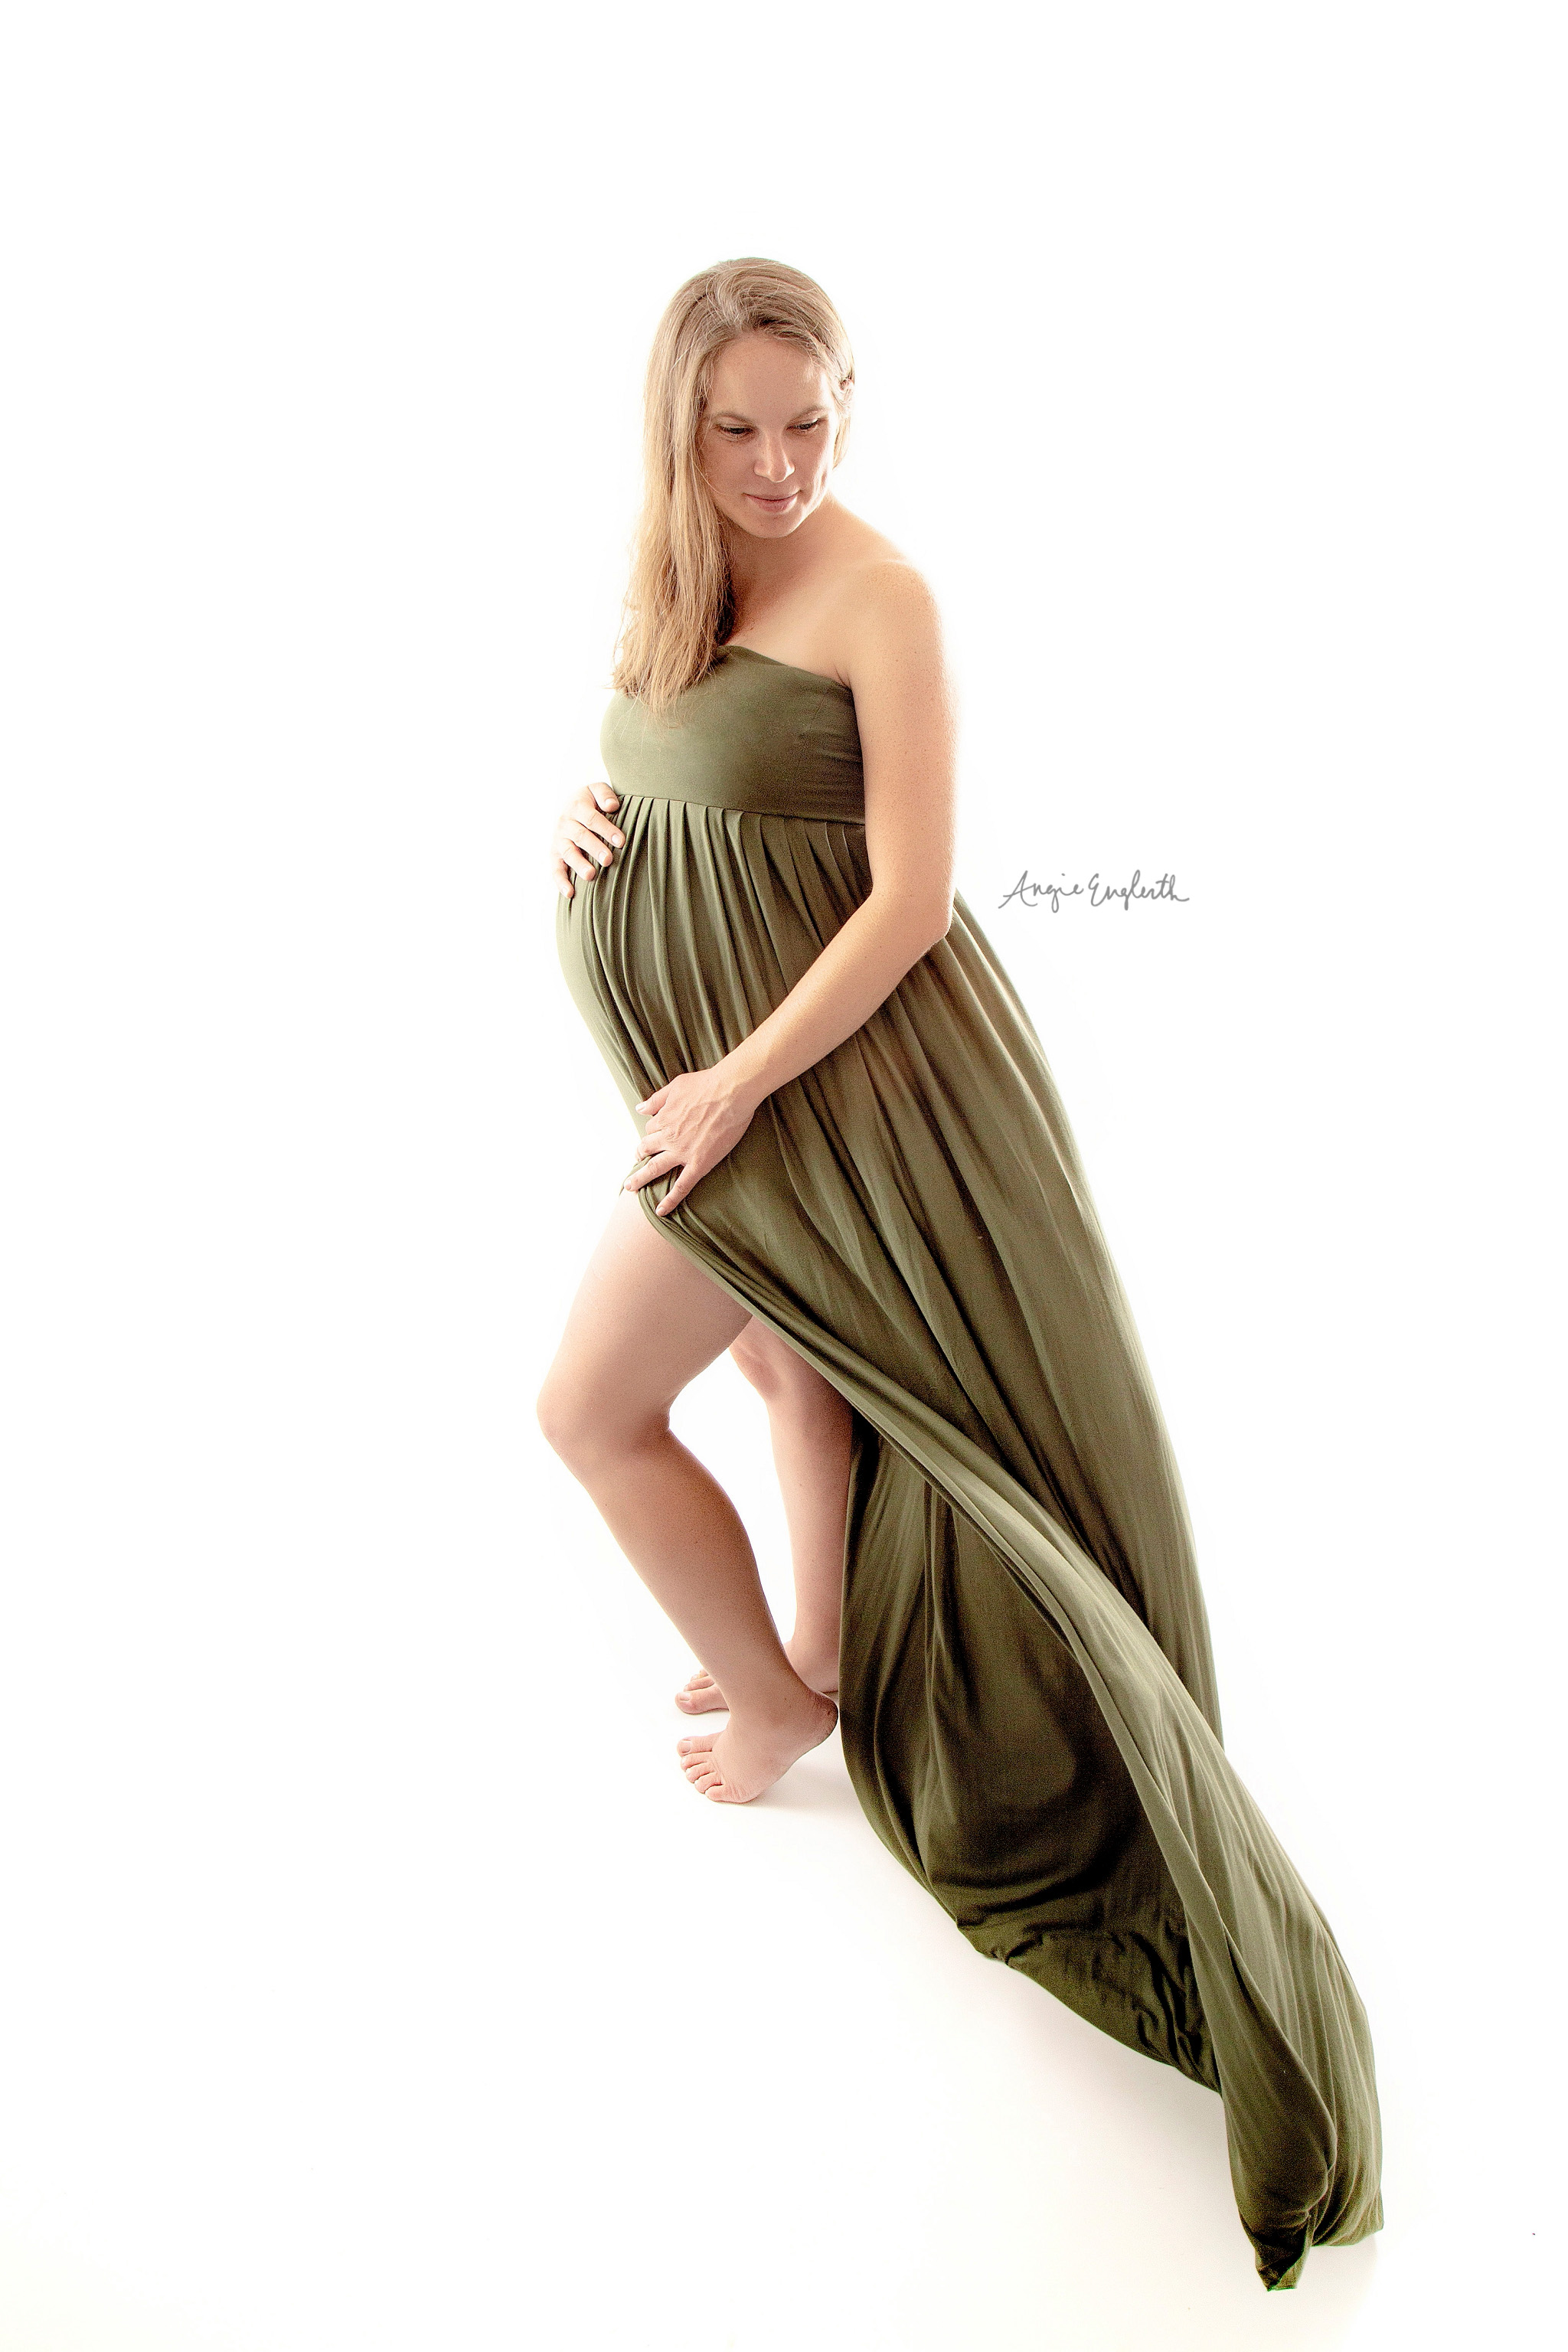 lancaster_maternity_photographer_angie_englerth_central_pa_b057.jpg